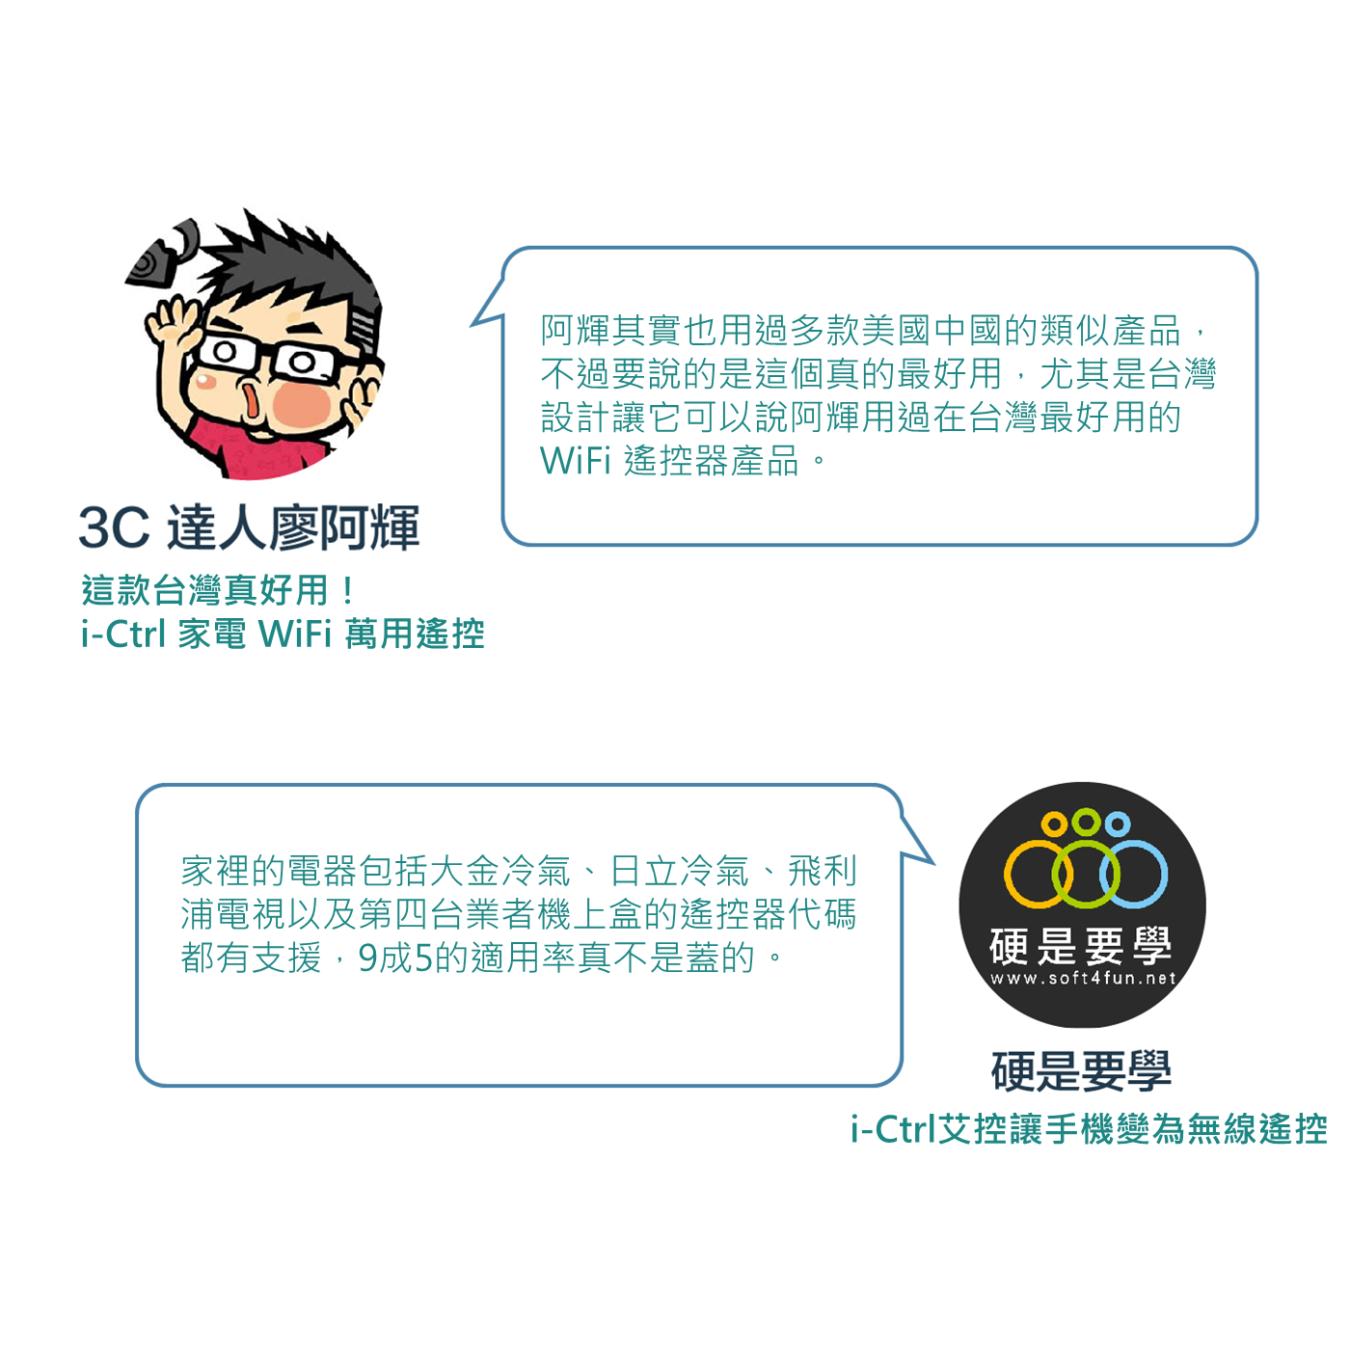 i-Ctrl 艾控 kol 家電遠端遙控 智慧家庭smart home艾法科技aifa